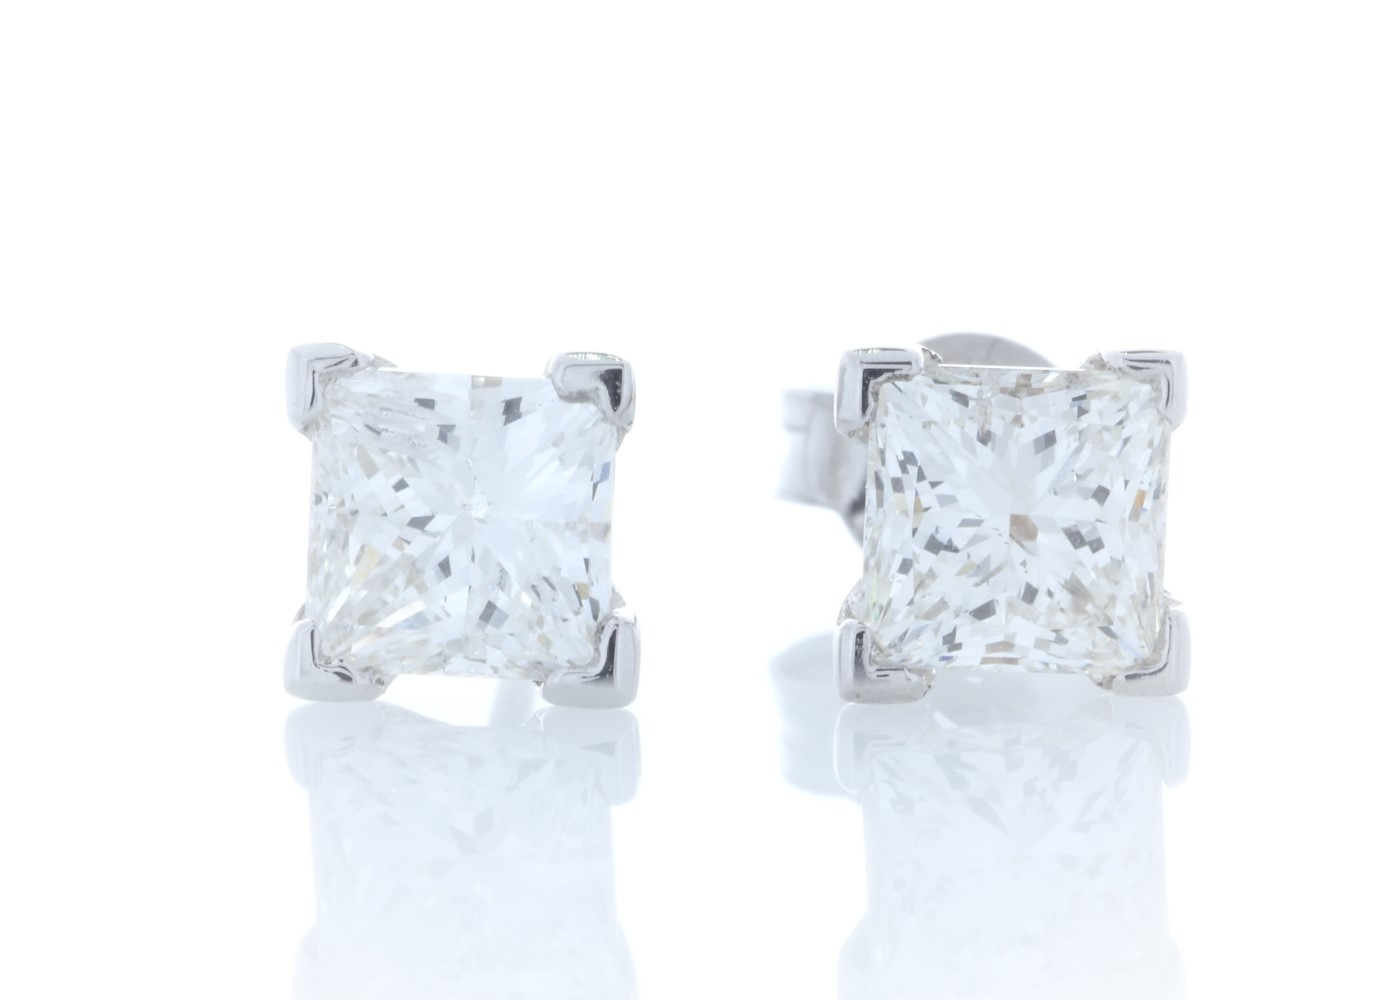 18ct White Gold Princess Cut Diamond Earrings 2.01 Carats